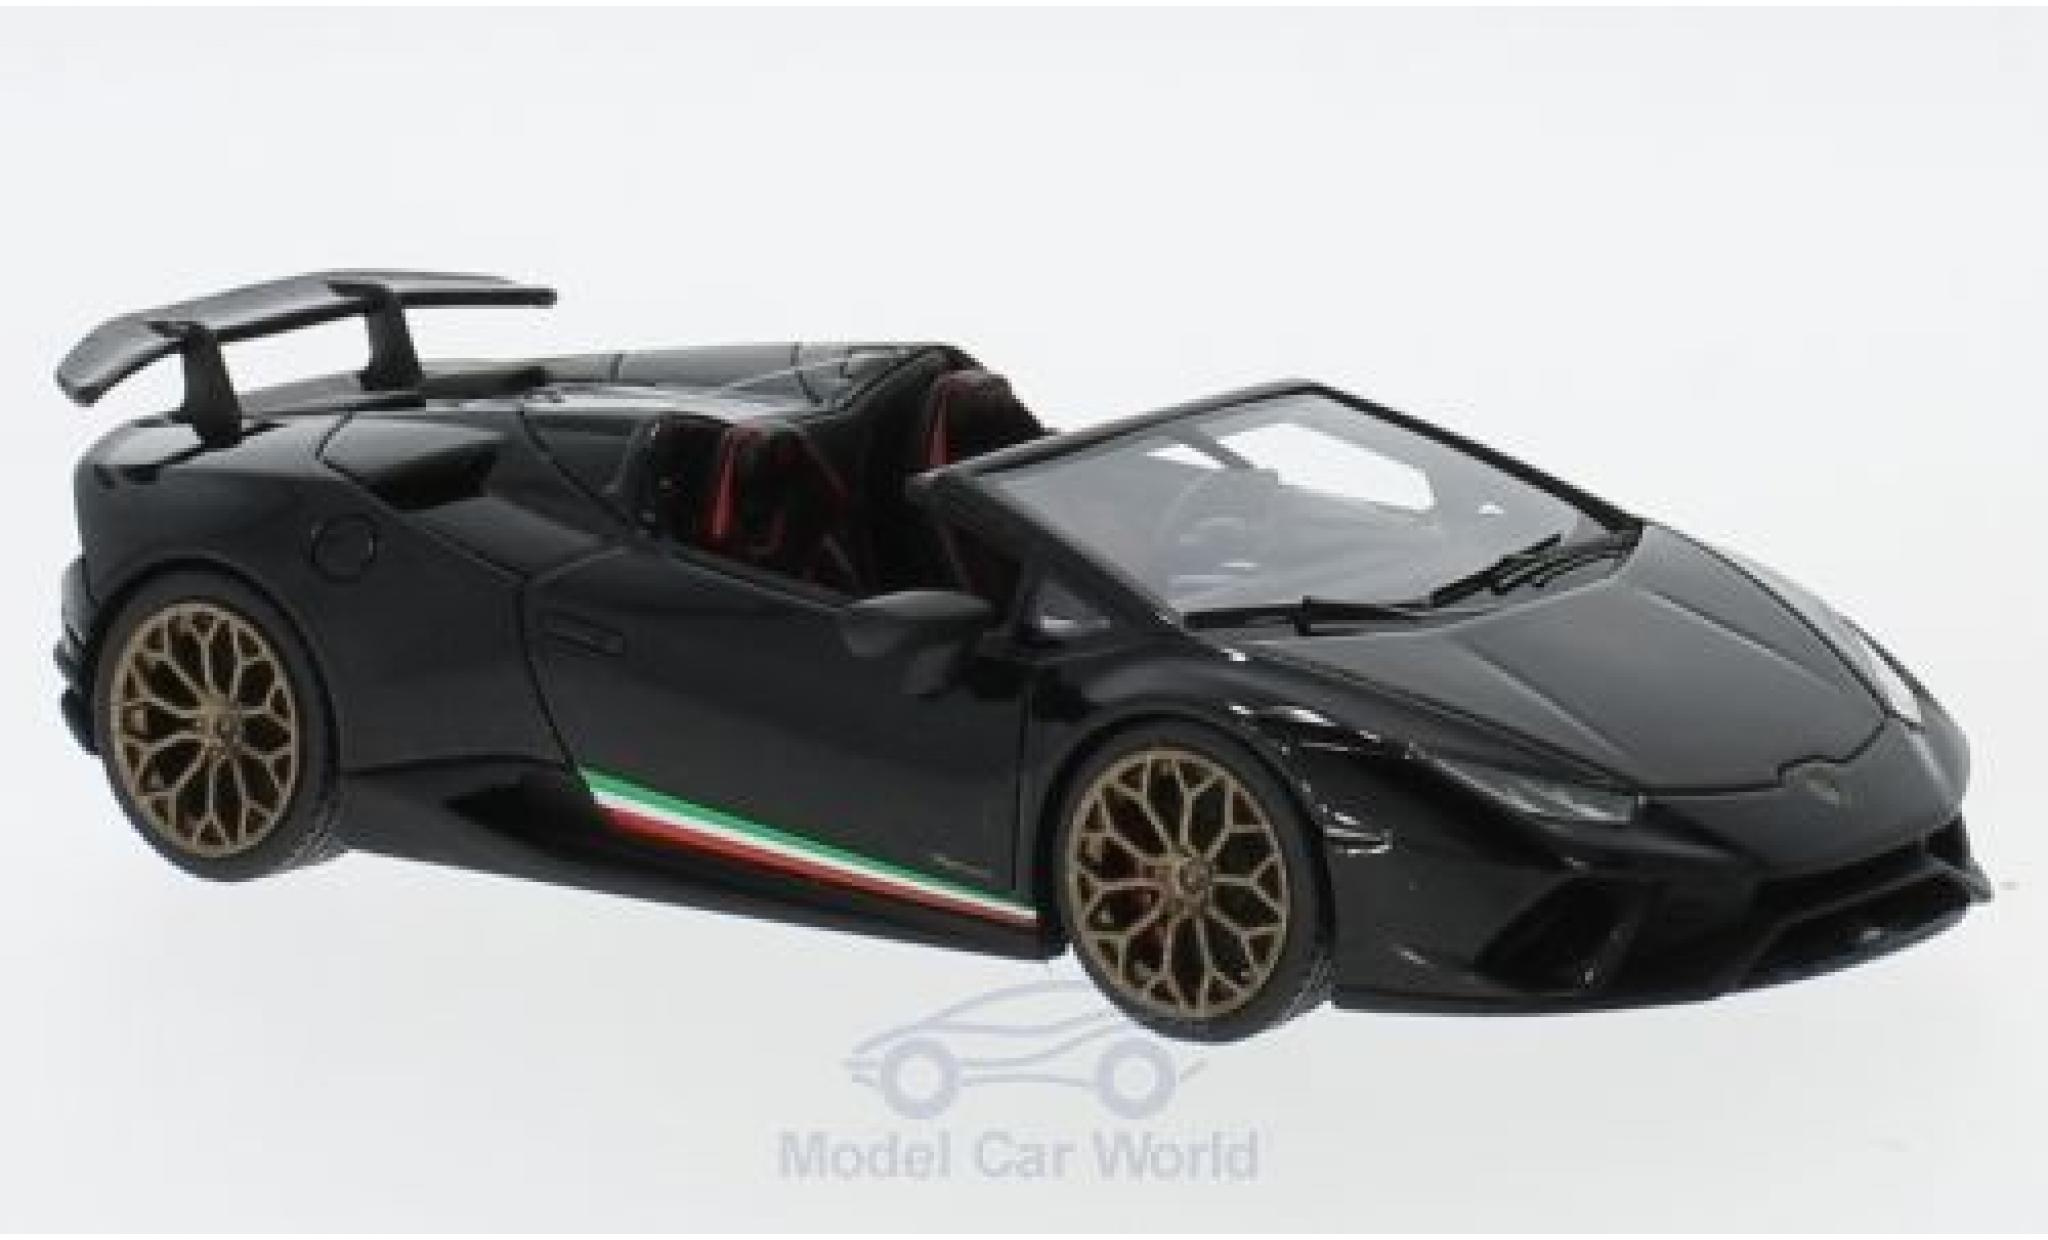 Lamborghini Huracan 1/43 Look Smart Performante Spyder metallise black